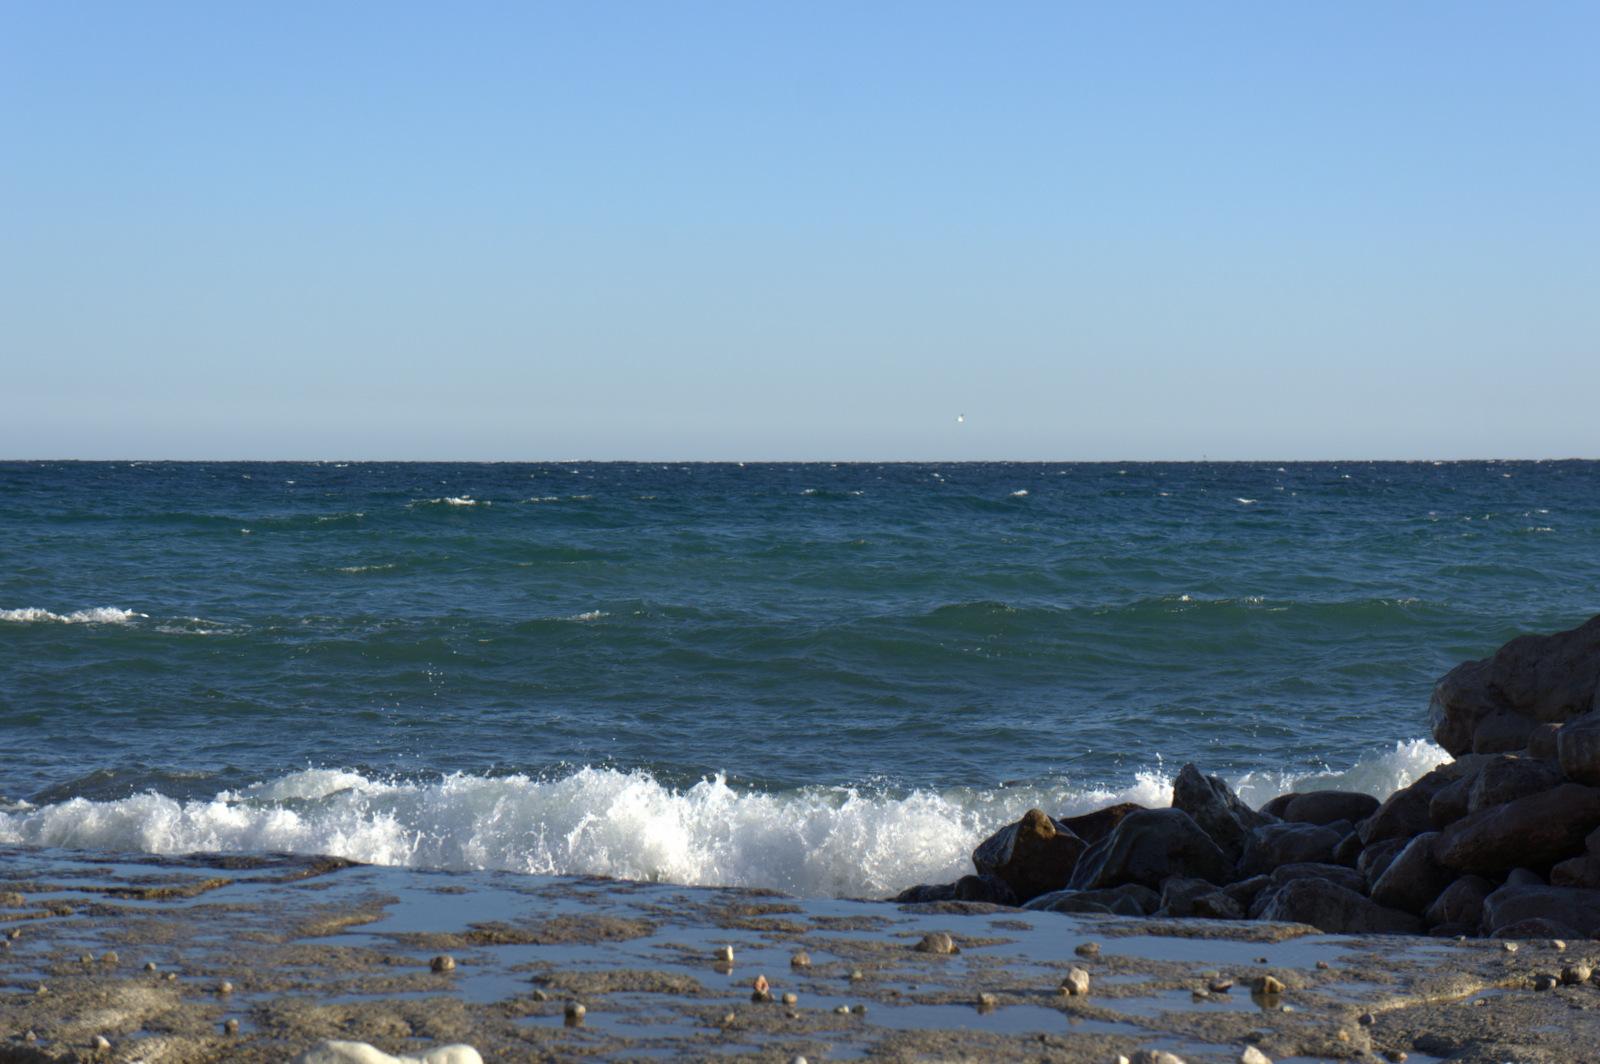 Море нахлынет, закопает в пески ... (с